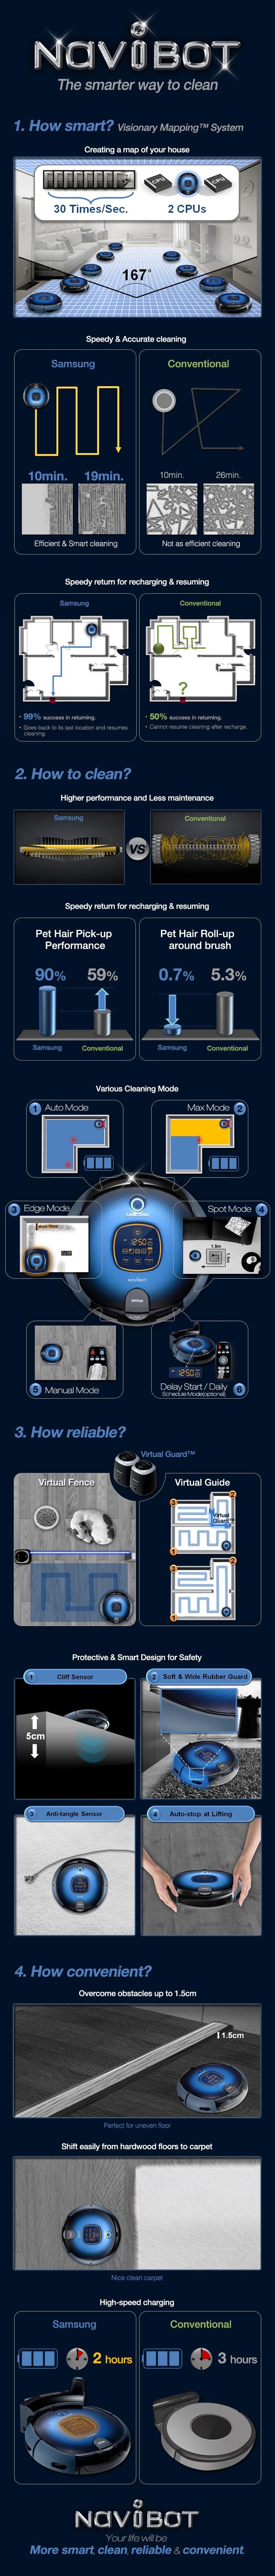 Roomba Floor Vac 2 Battery Diagram 1gif 528 Kb 267 Views Ixbtcom